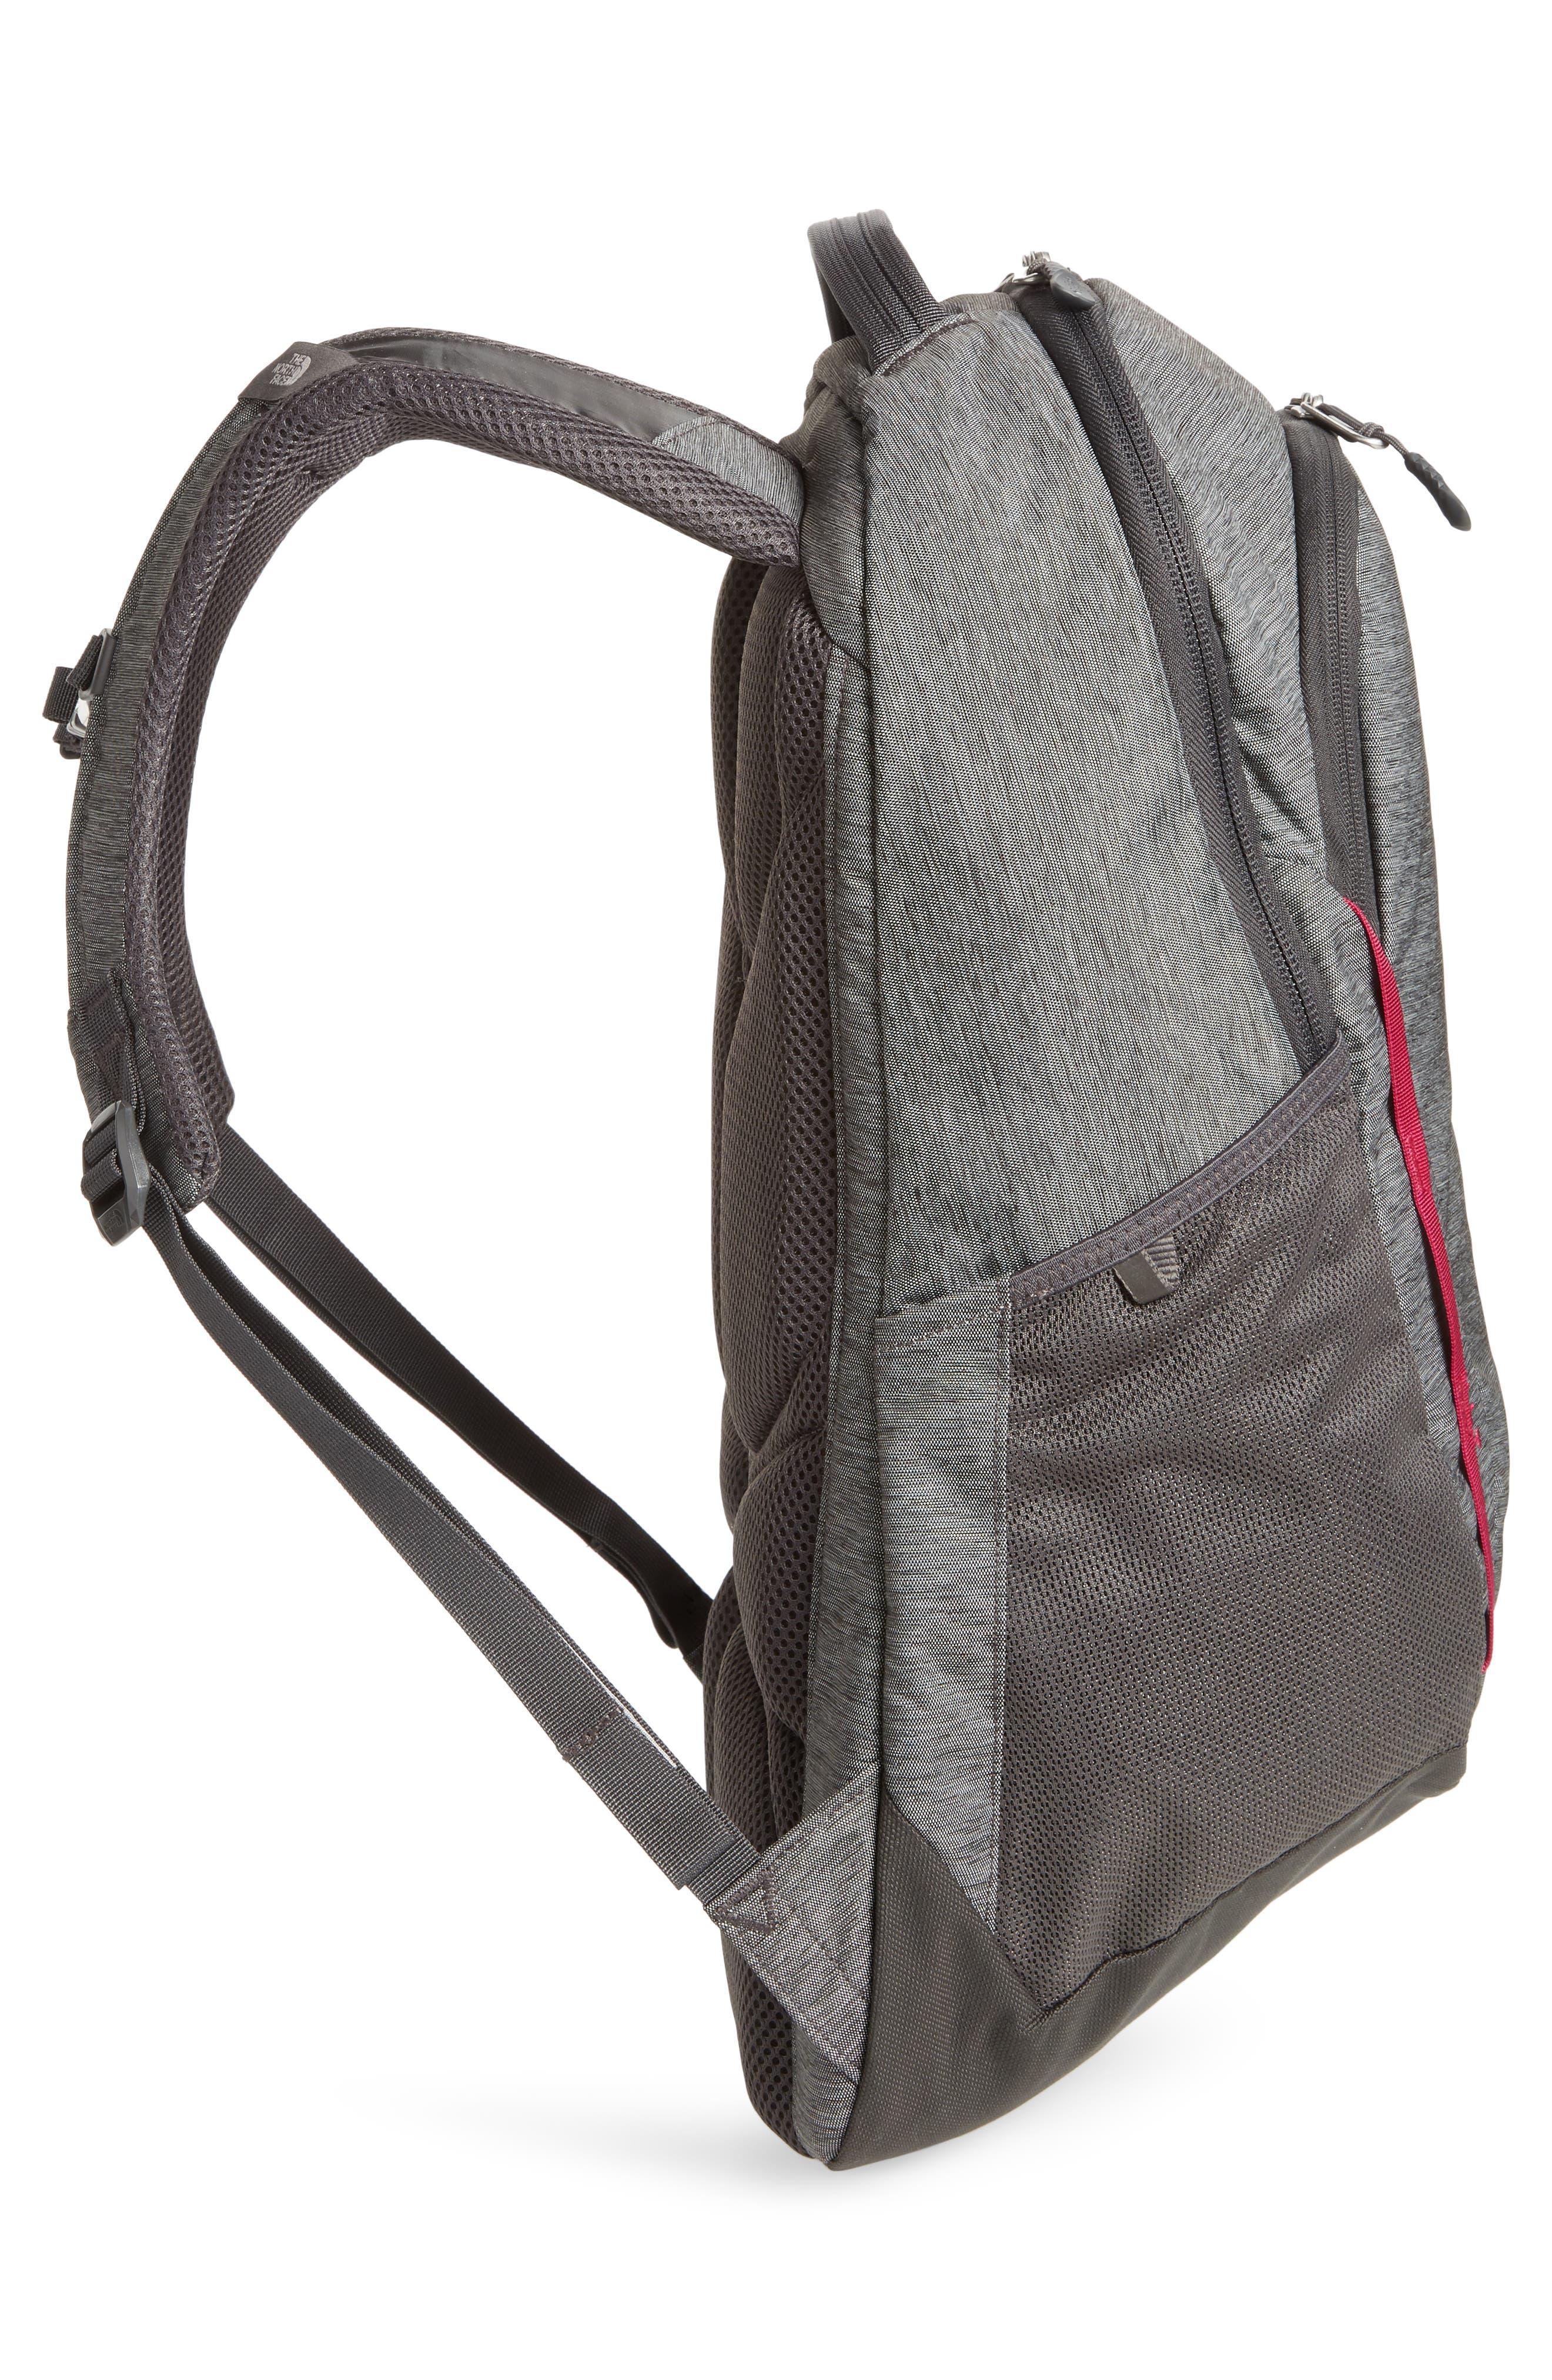 Vault Backpack,                             Alternate thumbnail 4, color,                             ASPHALT GREY/ DRAMATIC PLUM